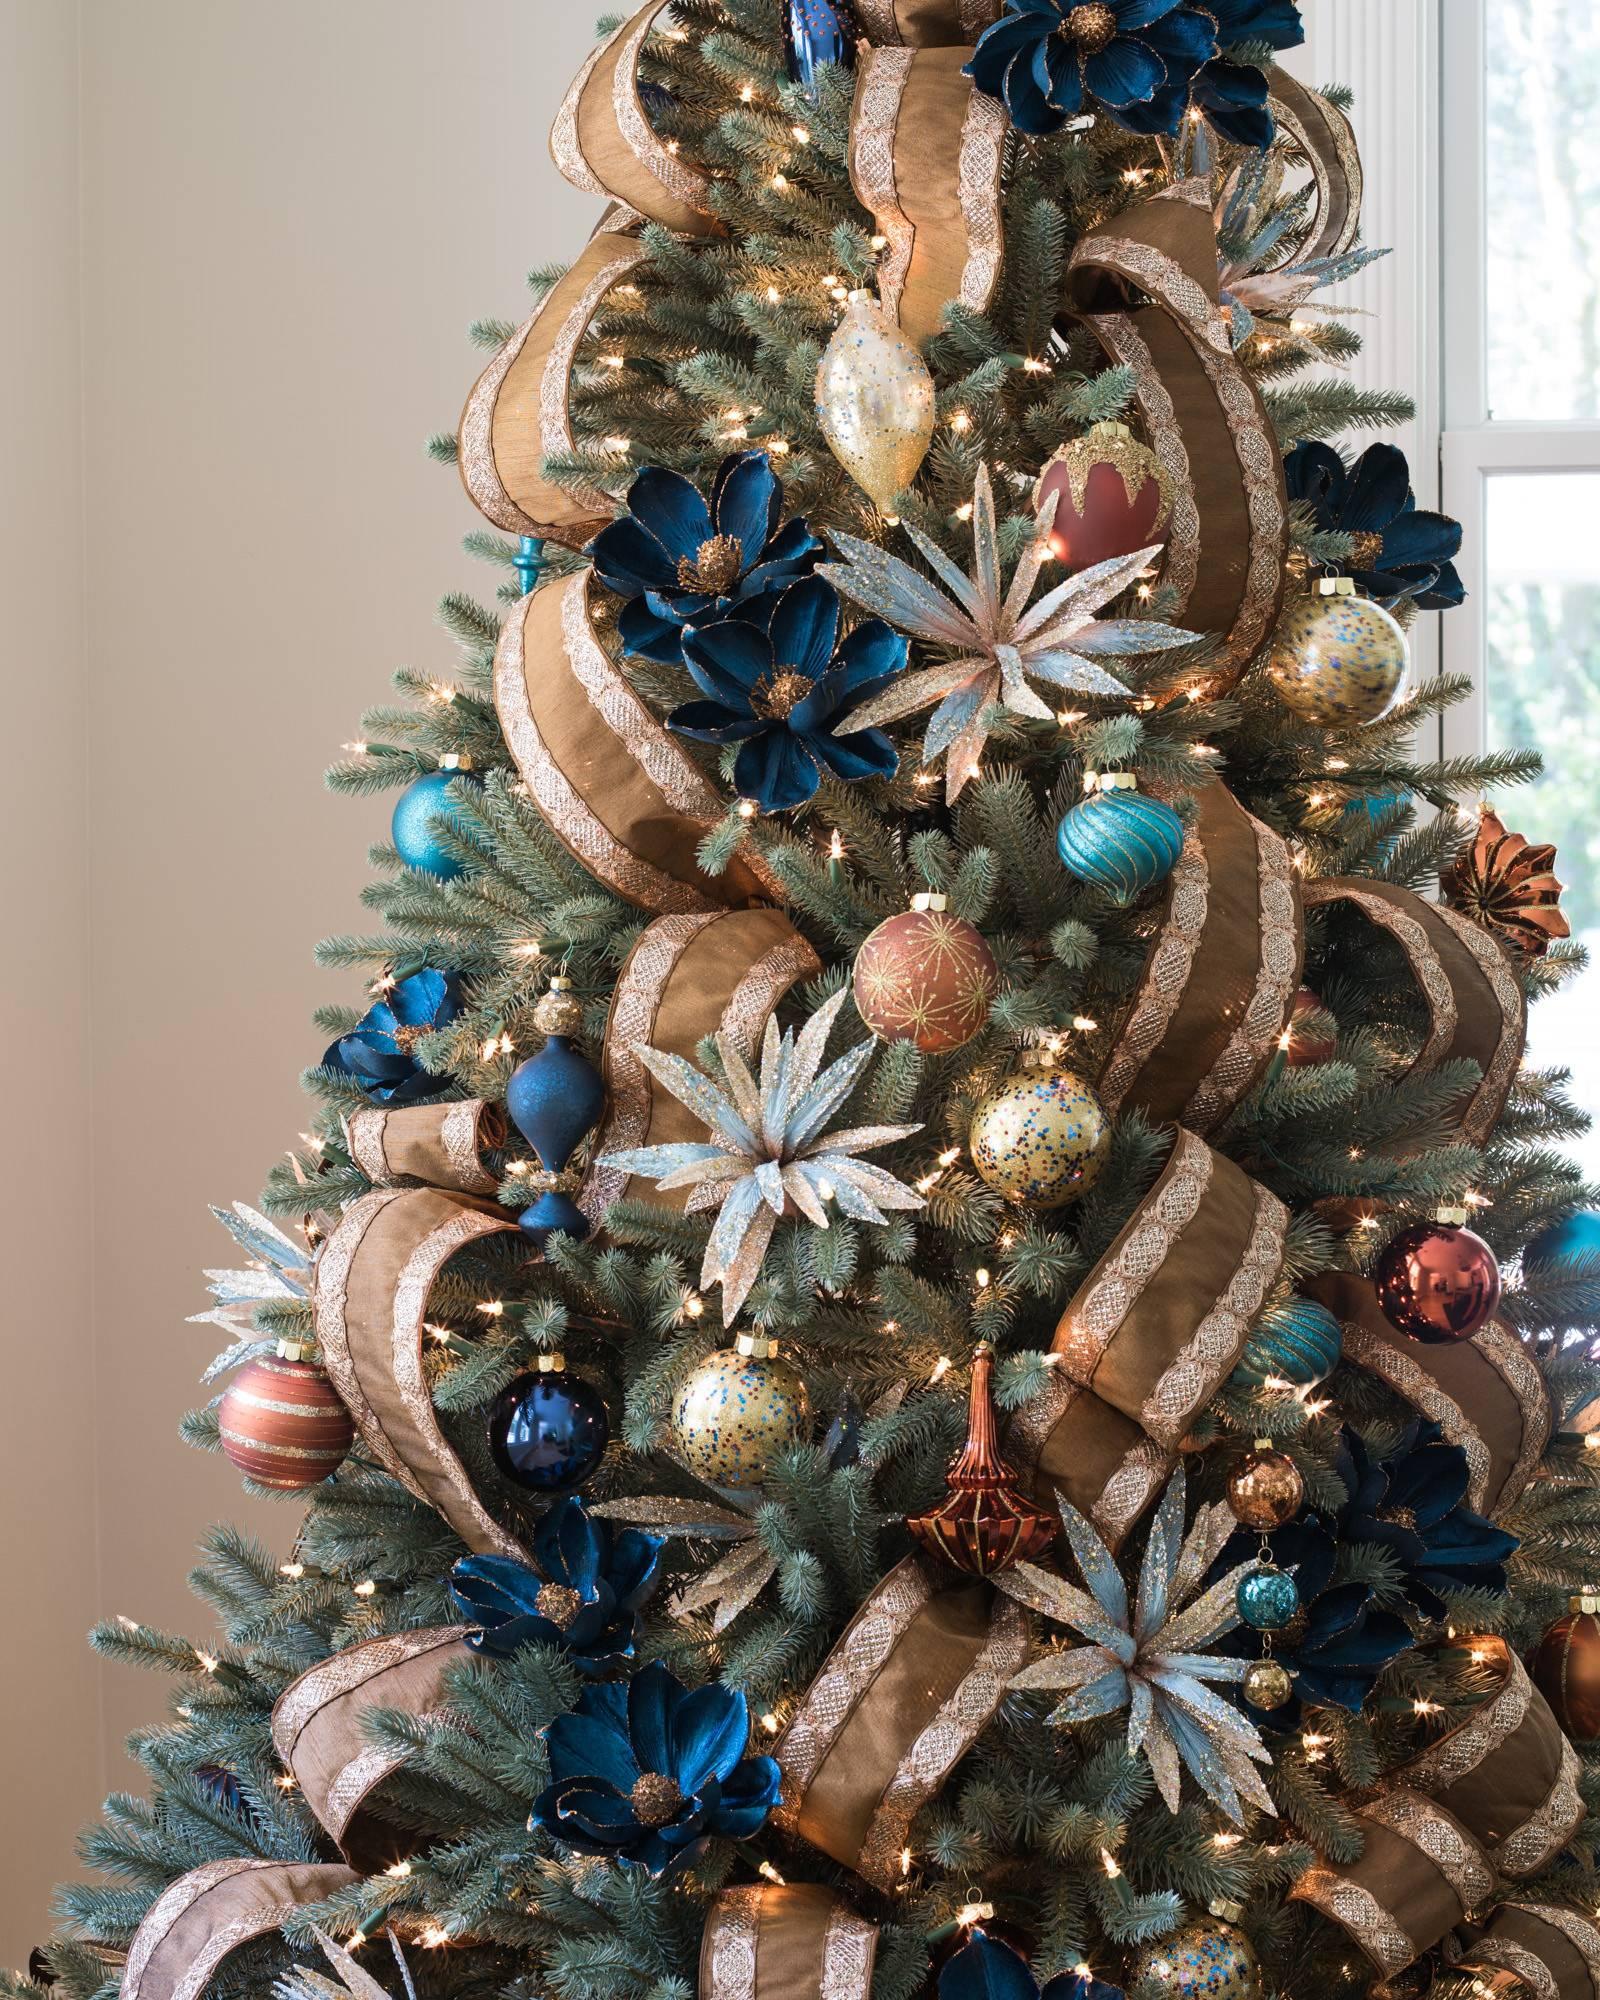 Xmas Tree Decorations With Ribbons: Lexington Christmas Ornament Set